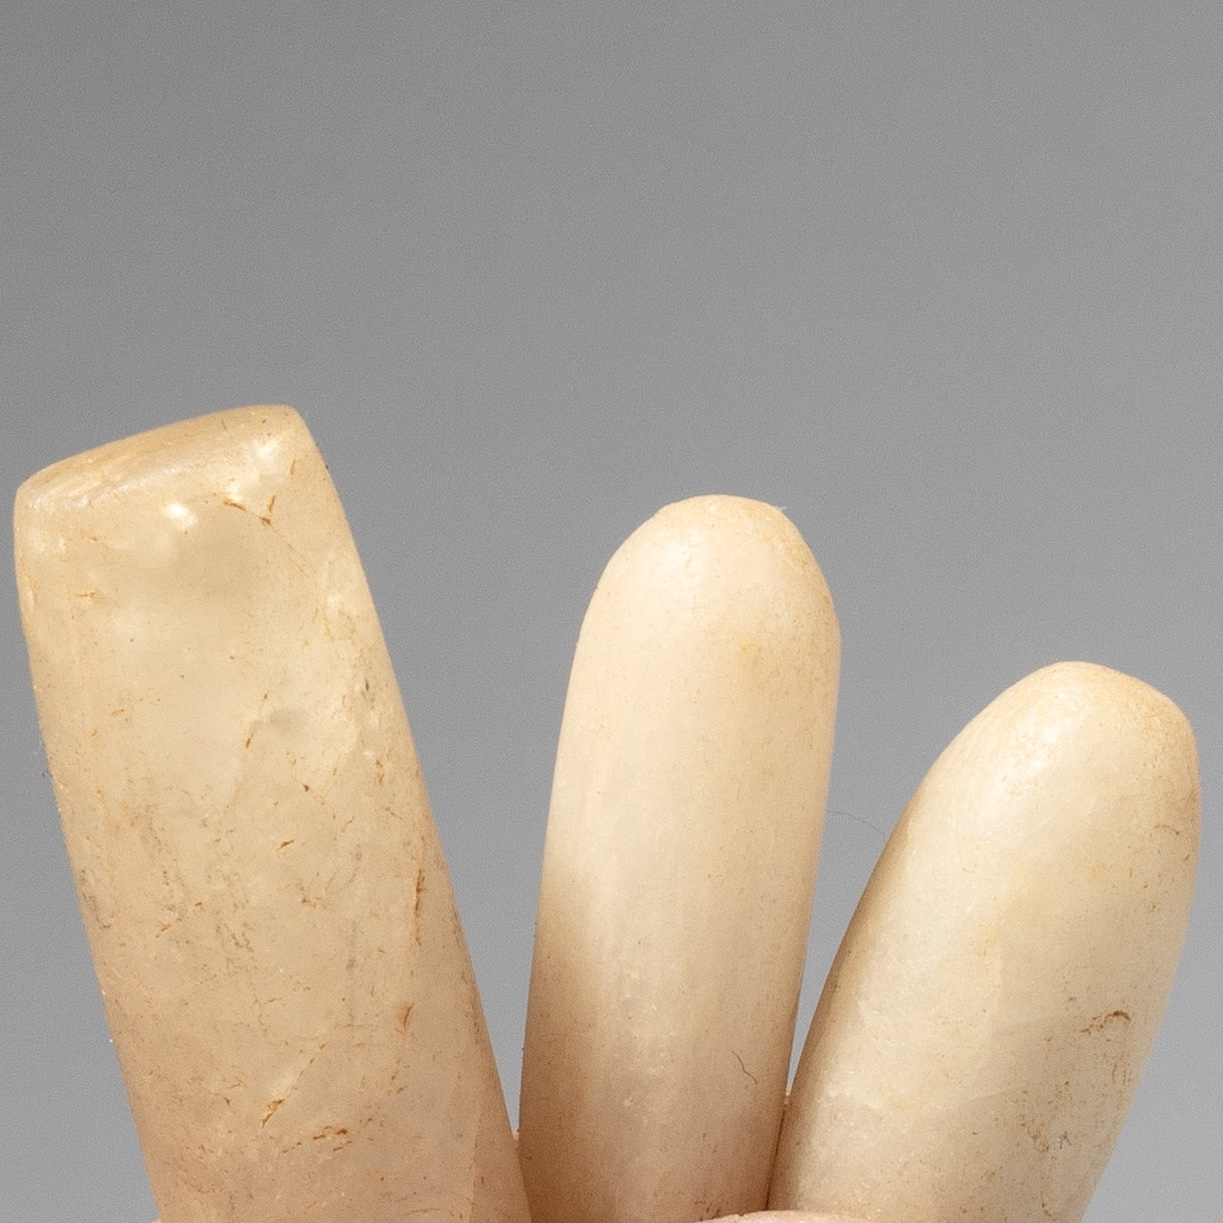 3 ANCIENT QUARTZ LIP PLUG LABARETS, SAHARA, W. AFRICA ( No 4286)